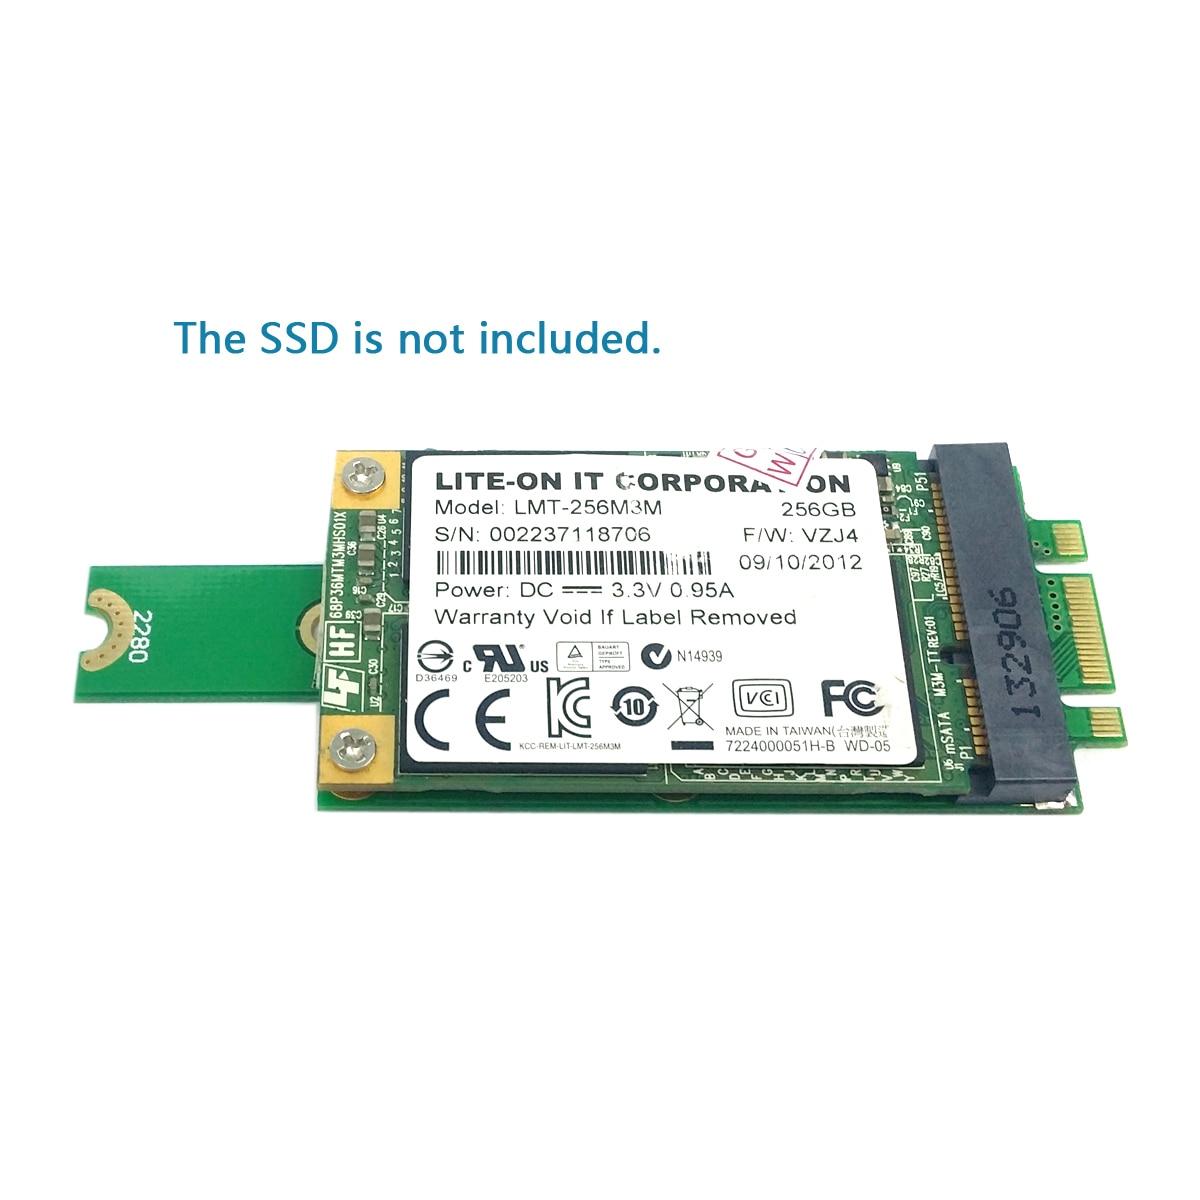 2 in 1 Combo Mini PCI-E 2 Lane M.2 NGFF /& mSATA SSD to SATA 3.0 III Adapter PCBA